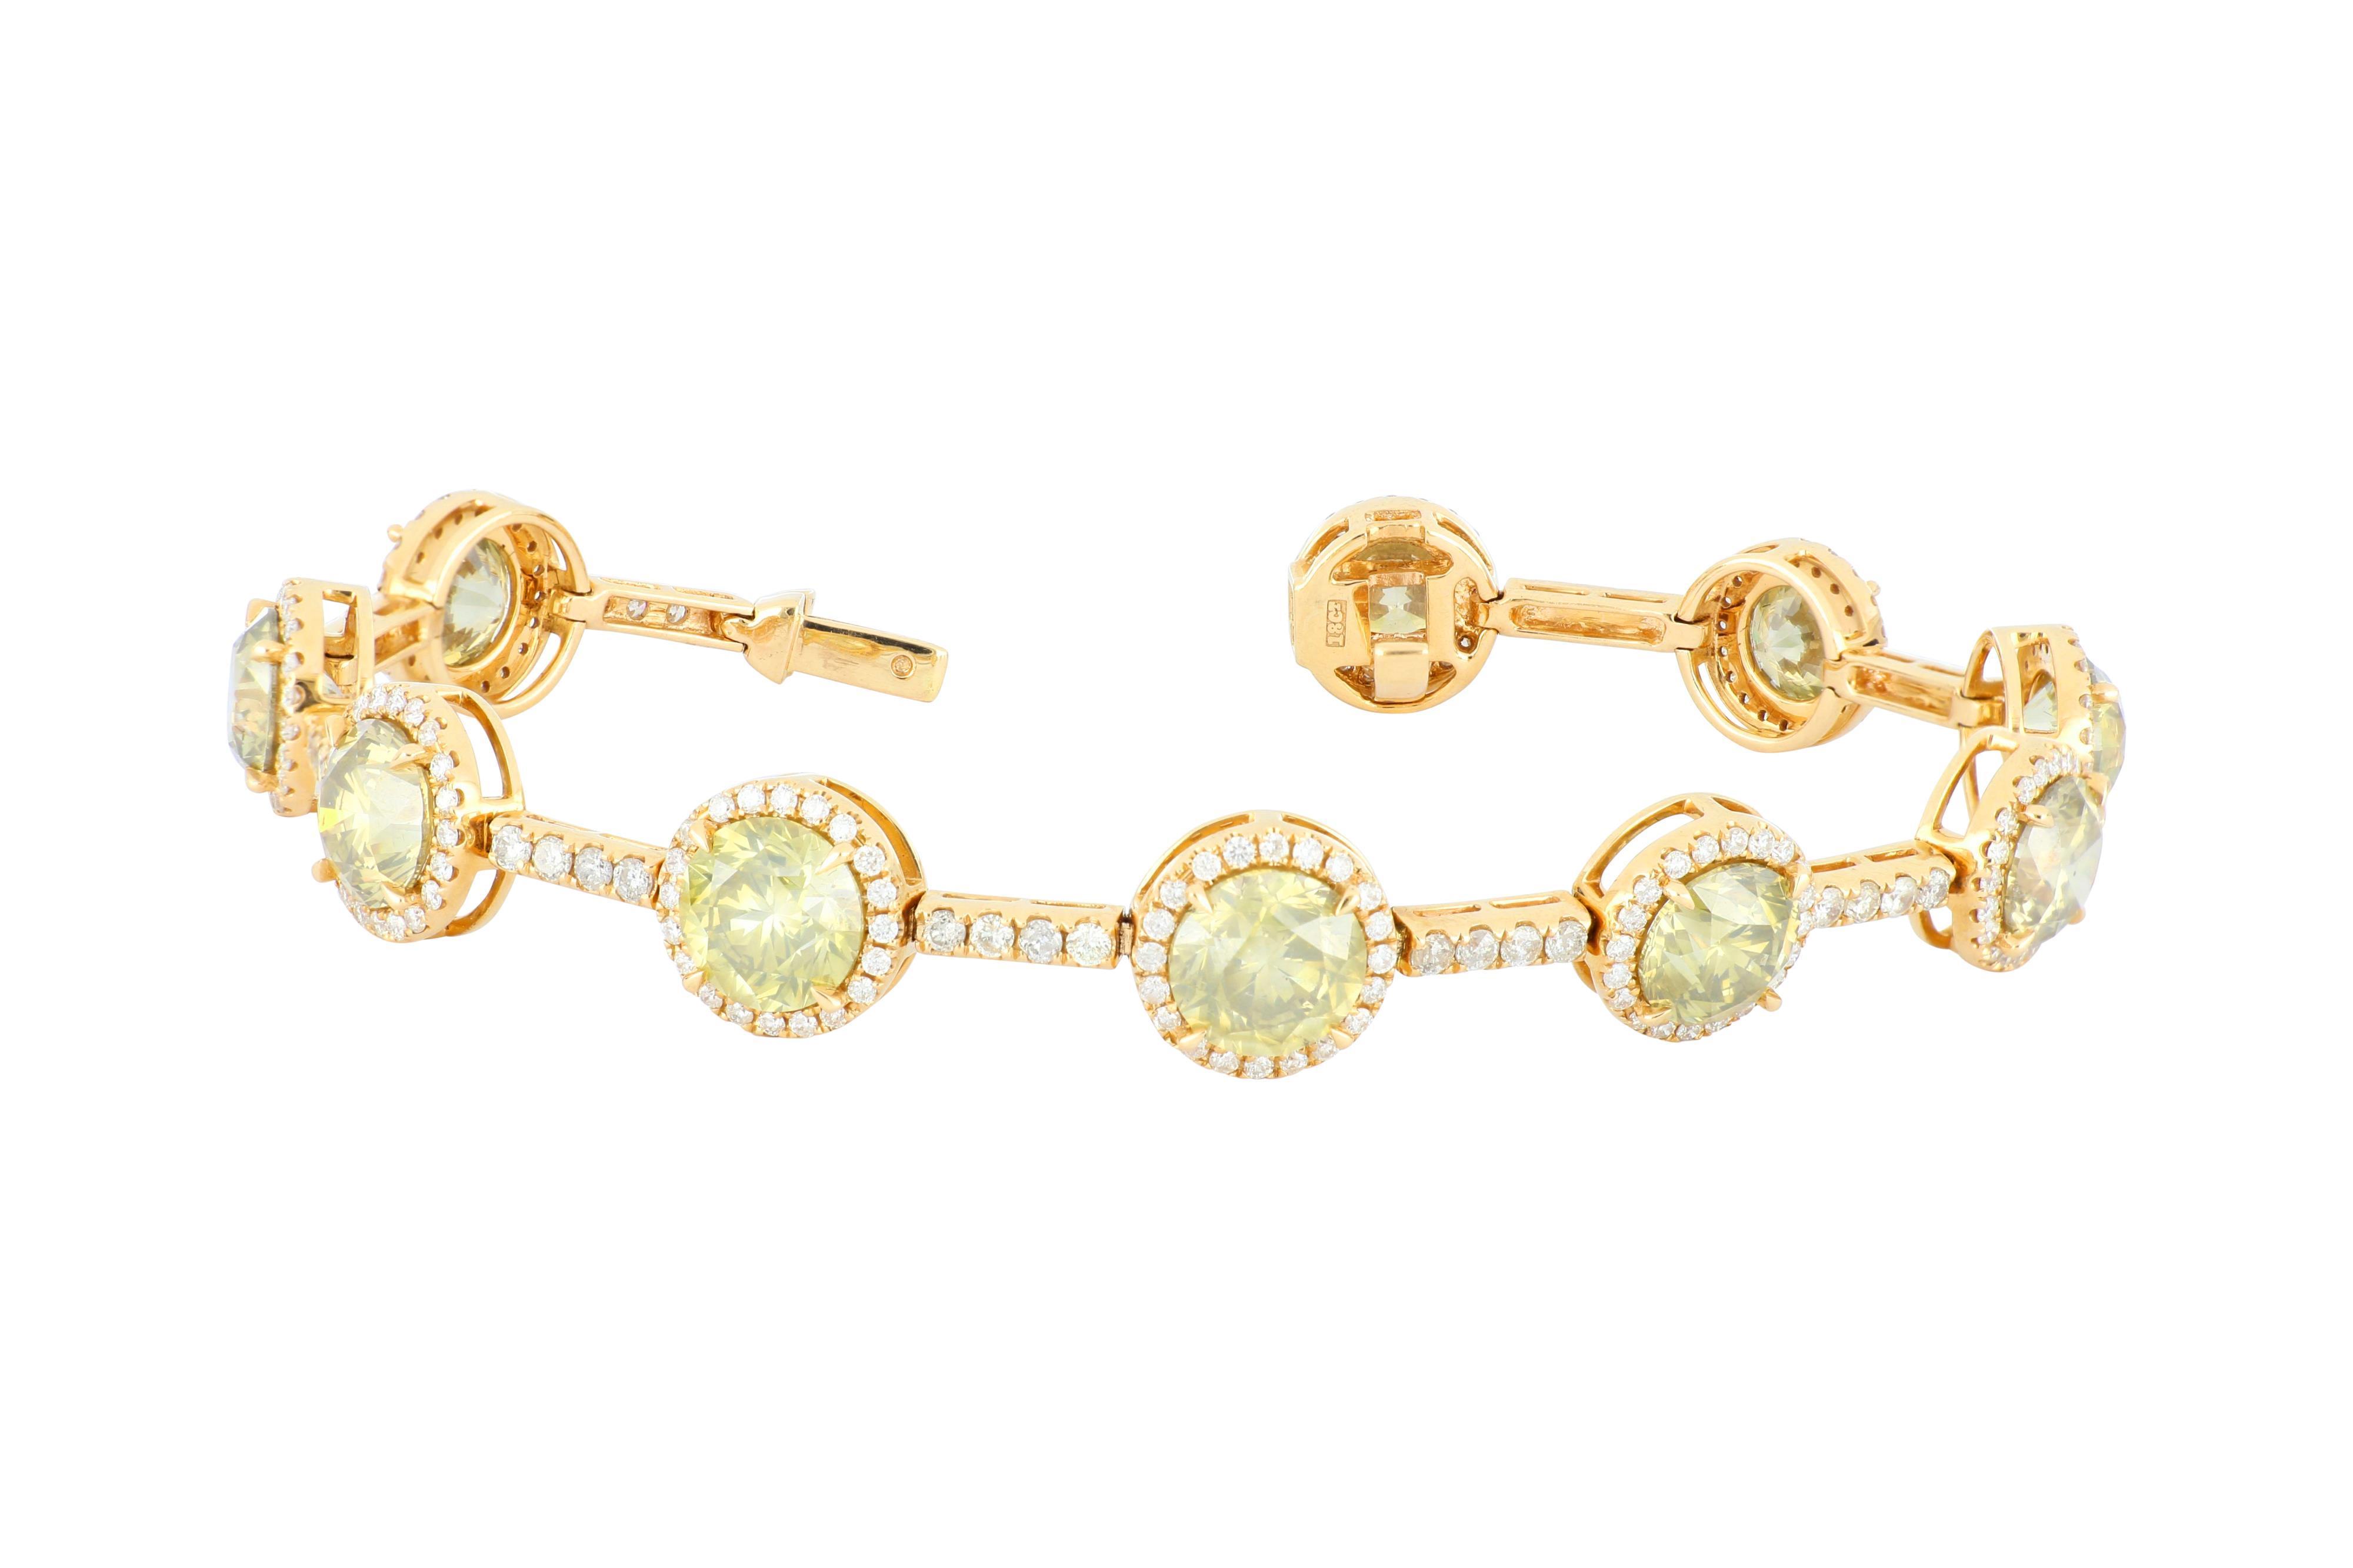 18ct rose gold diamond cluster tennis bracelet, 14.42 grams